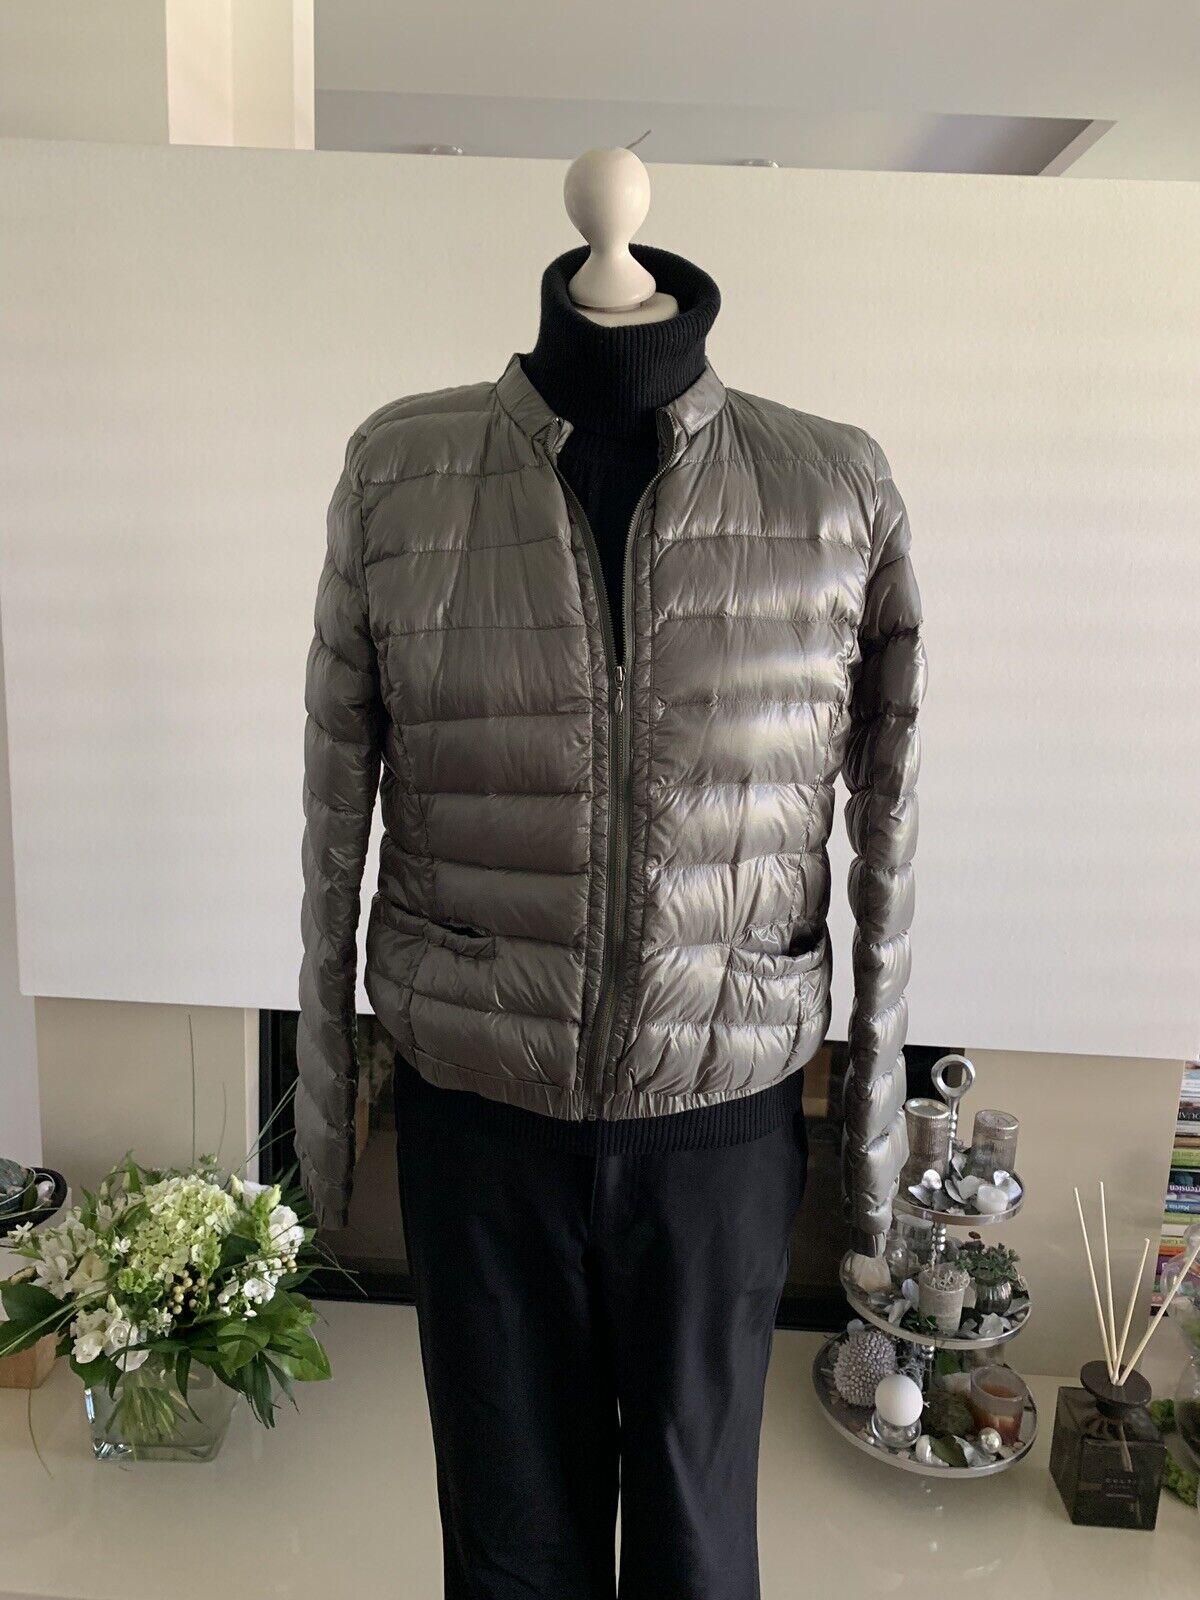 6477bebeb41dc9 JULIE BRANDT Sommerdaunen Jacke Damen Gr. 40 Jacke DE Oliv nouqea5236-neue  Kleidung